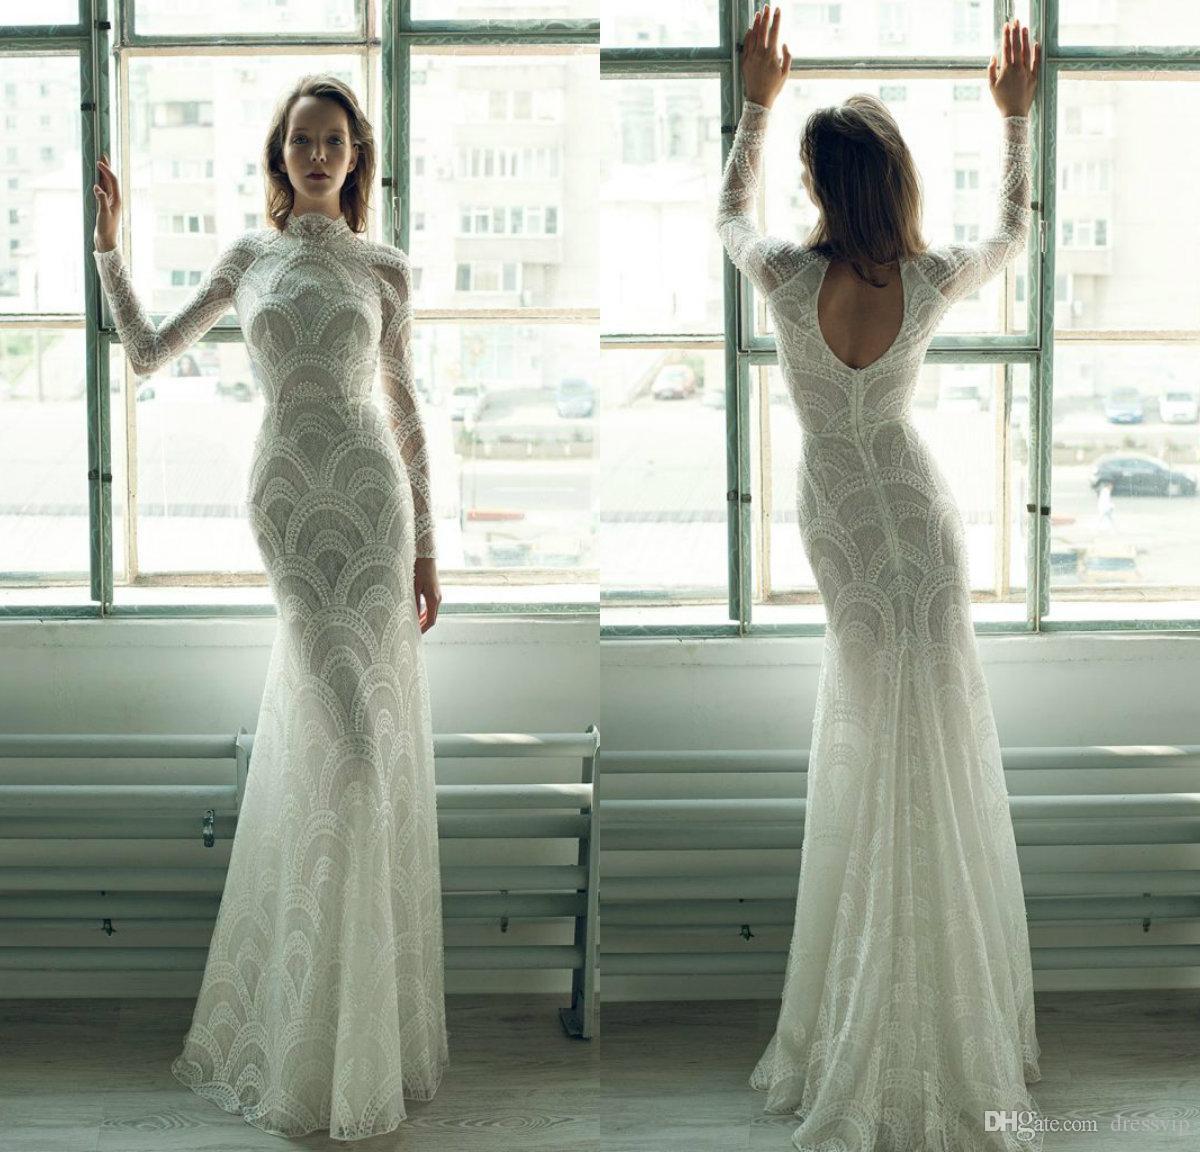 4530975eaac08 Ersa Atelier Mermaid Wedding Dresses High Neck Lace Hollow Back Floor  Length Beach Wedding Dress Custom Pearls Long Sleeve Bridal Gowns Purple Wedding  Dress ...